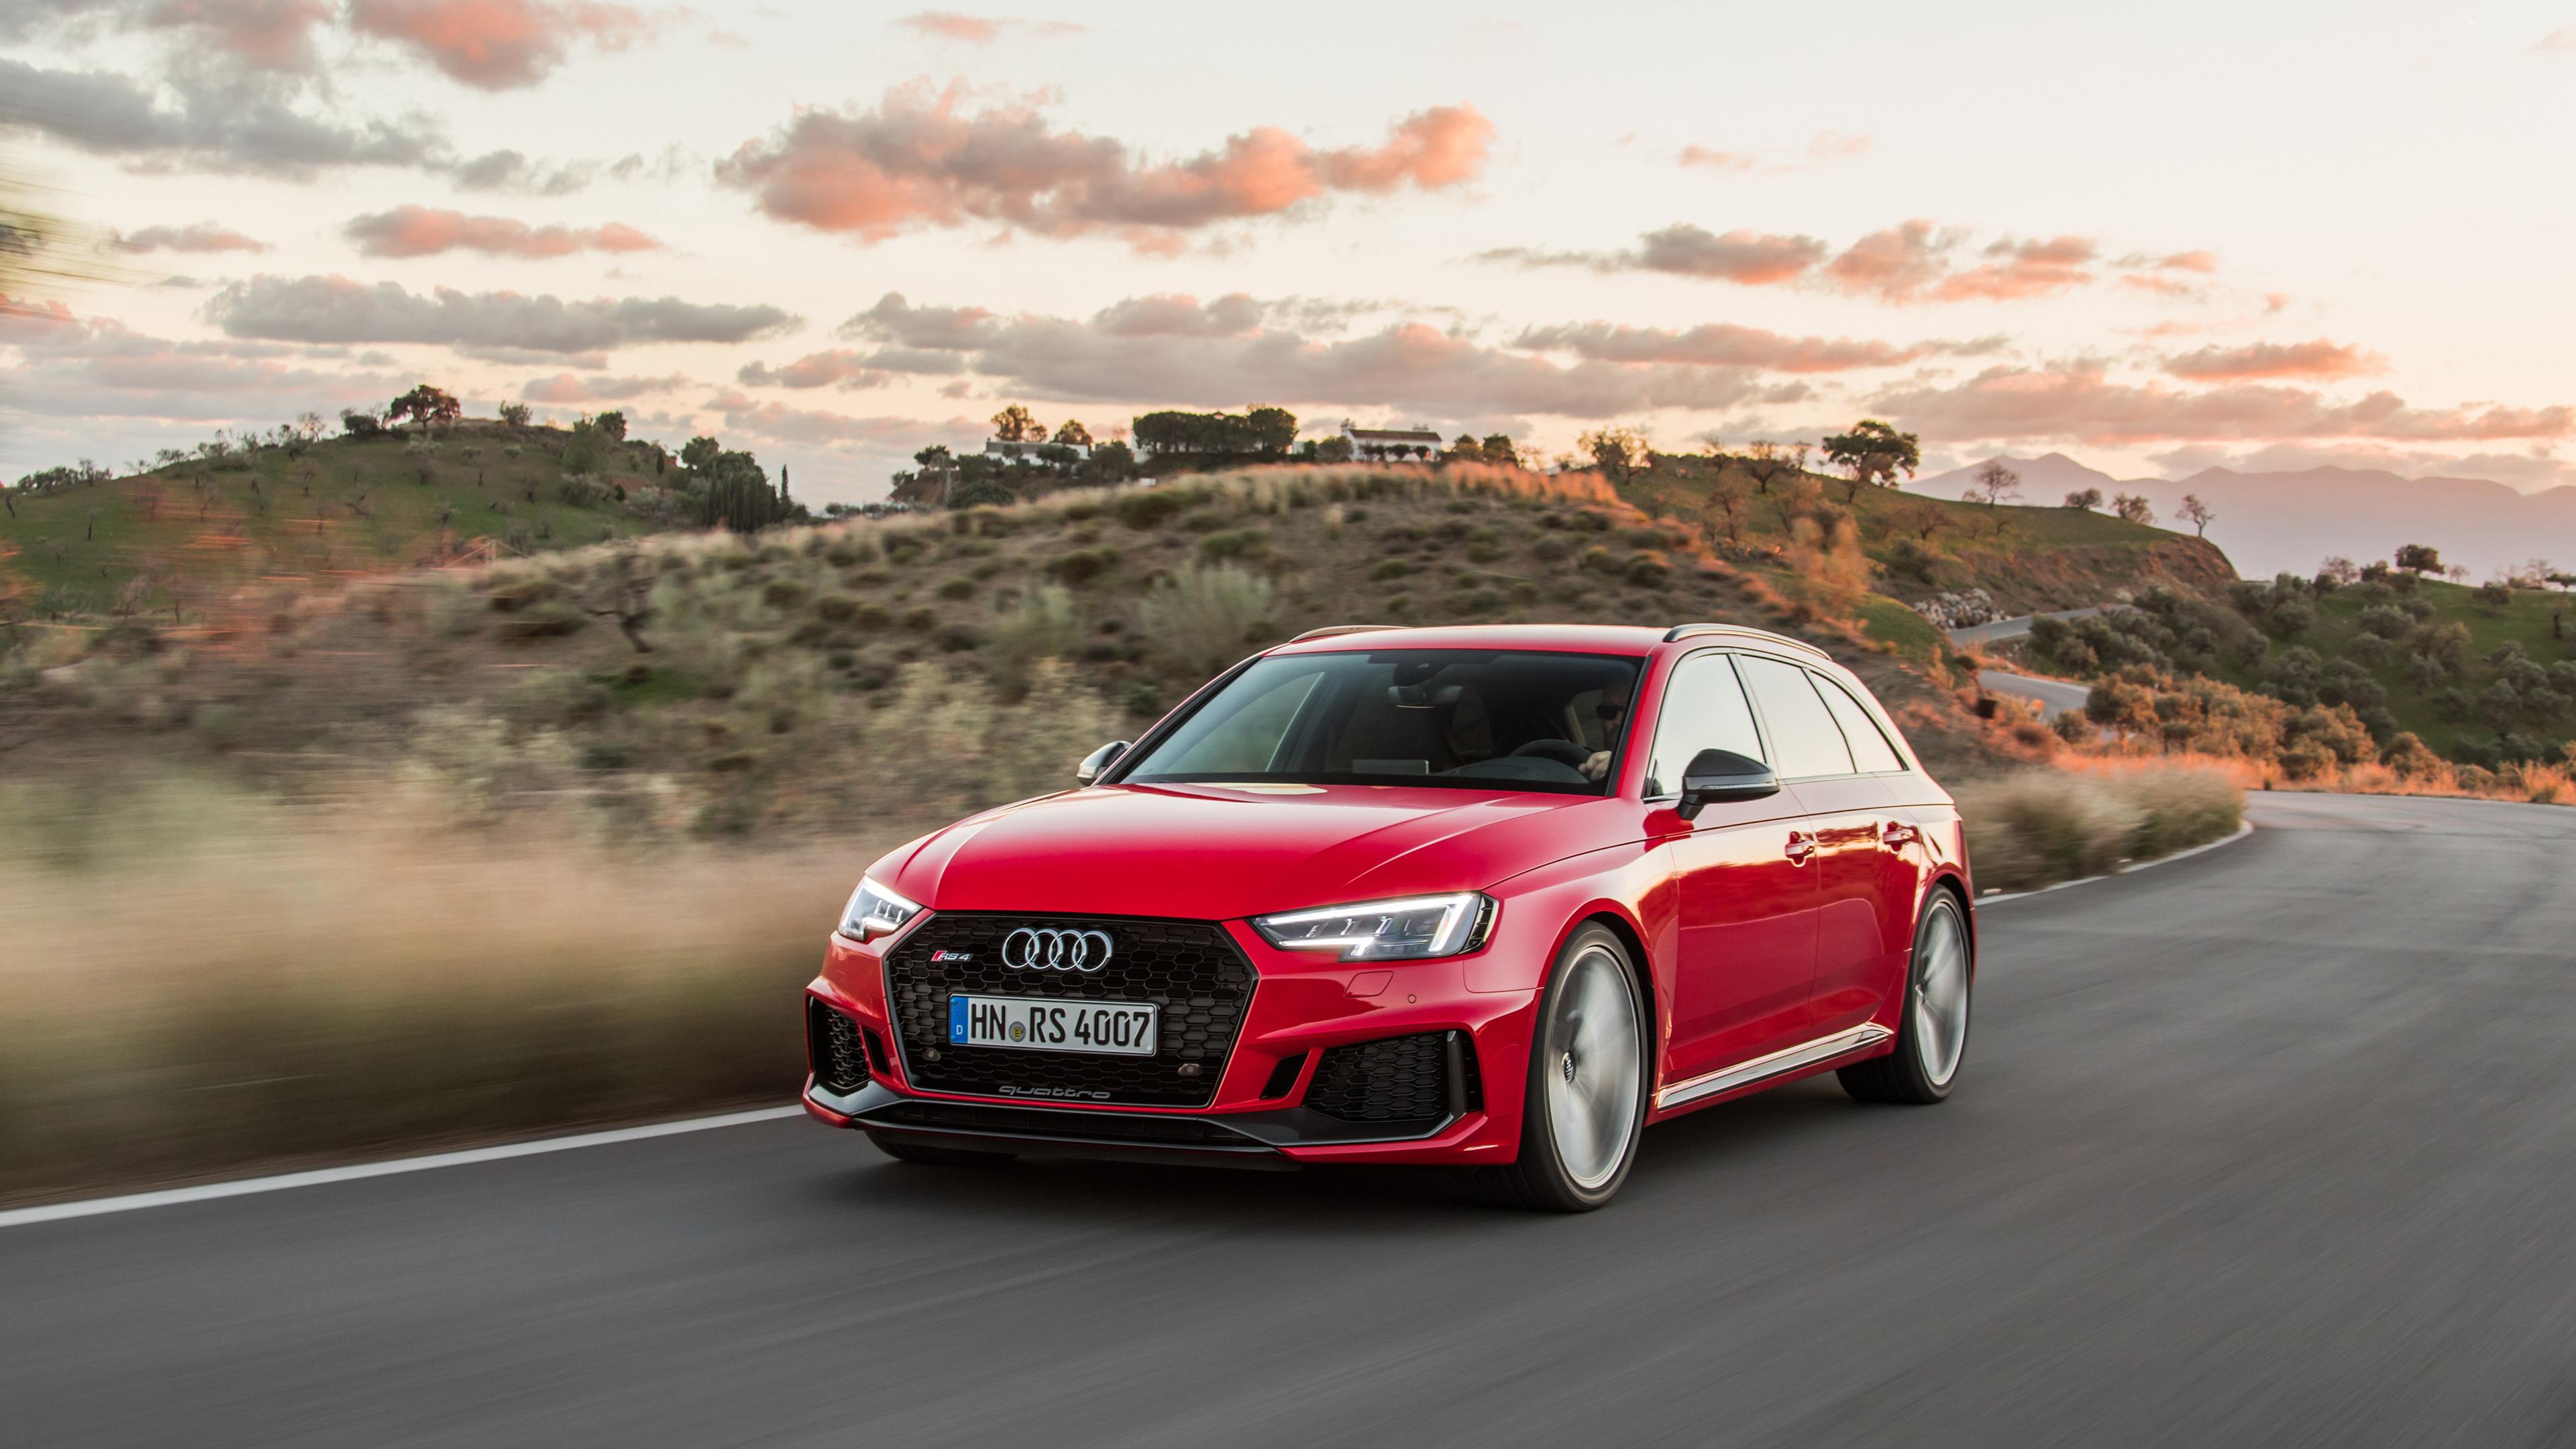 audi rs 4 avant 1539108574 - Audi Rs 4 Avant - hd-wallpapers, cars wallpapers, audi wallpapers, audi rs 4 avant wallpapers, 4k-wallpapers, 2017 cars wallpapers